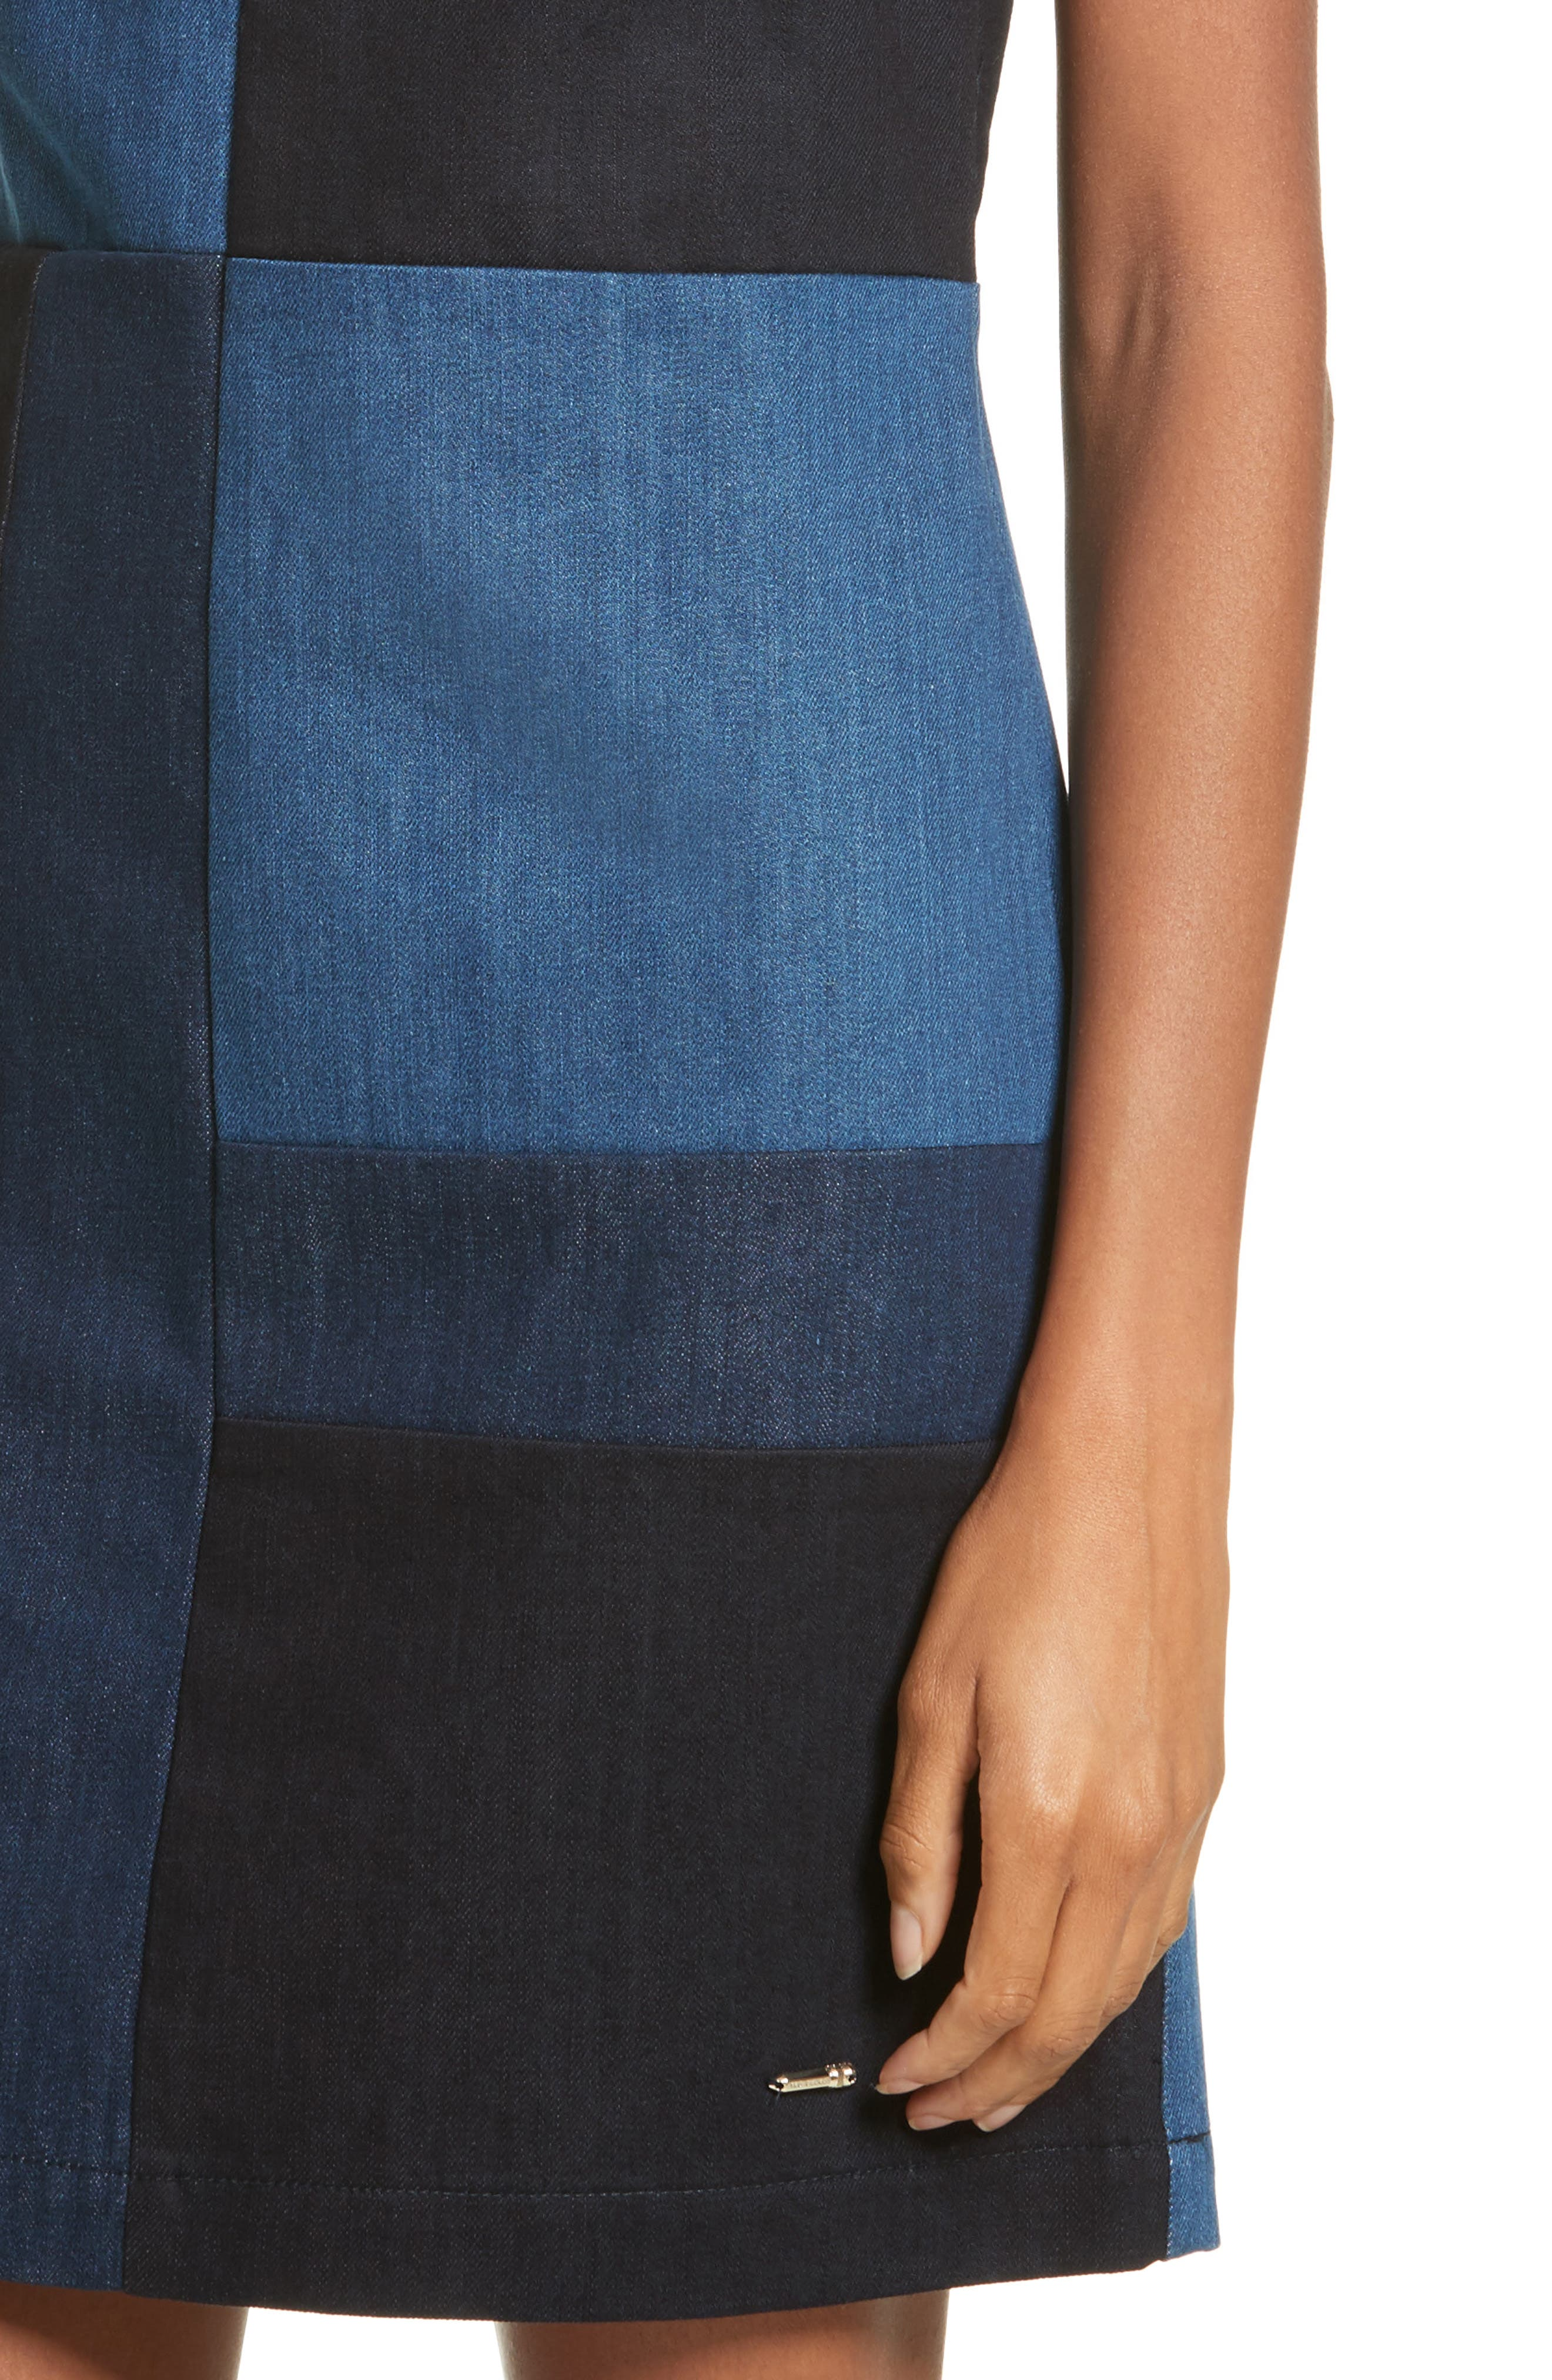 Ted Baker Morfee London Colorblock Denim A-Line Dress,                             Alternate thumbnail 4, color,                             431